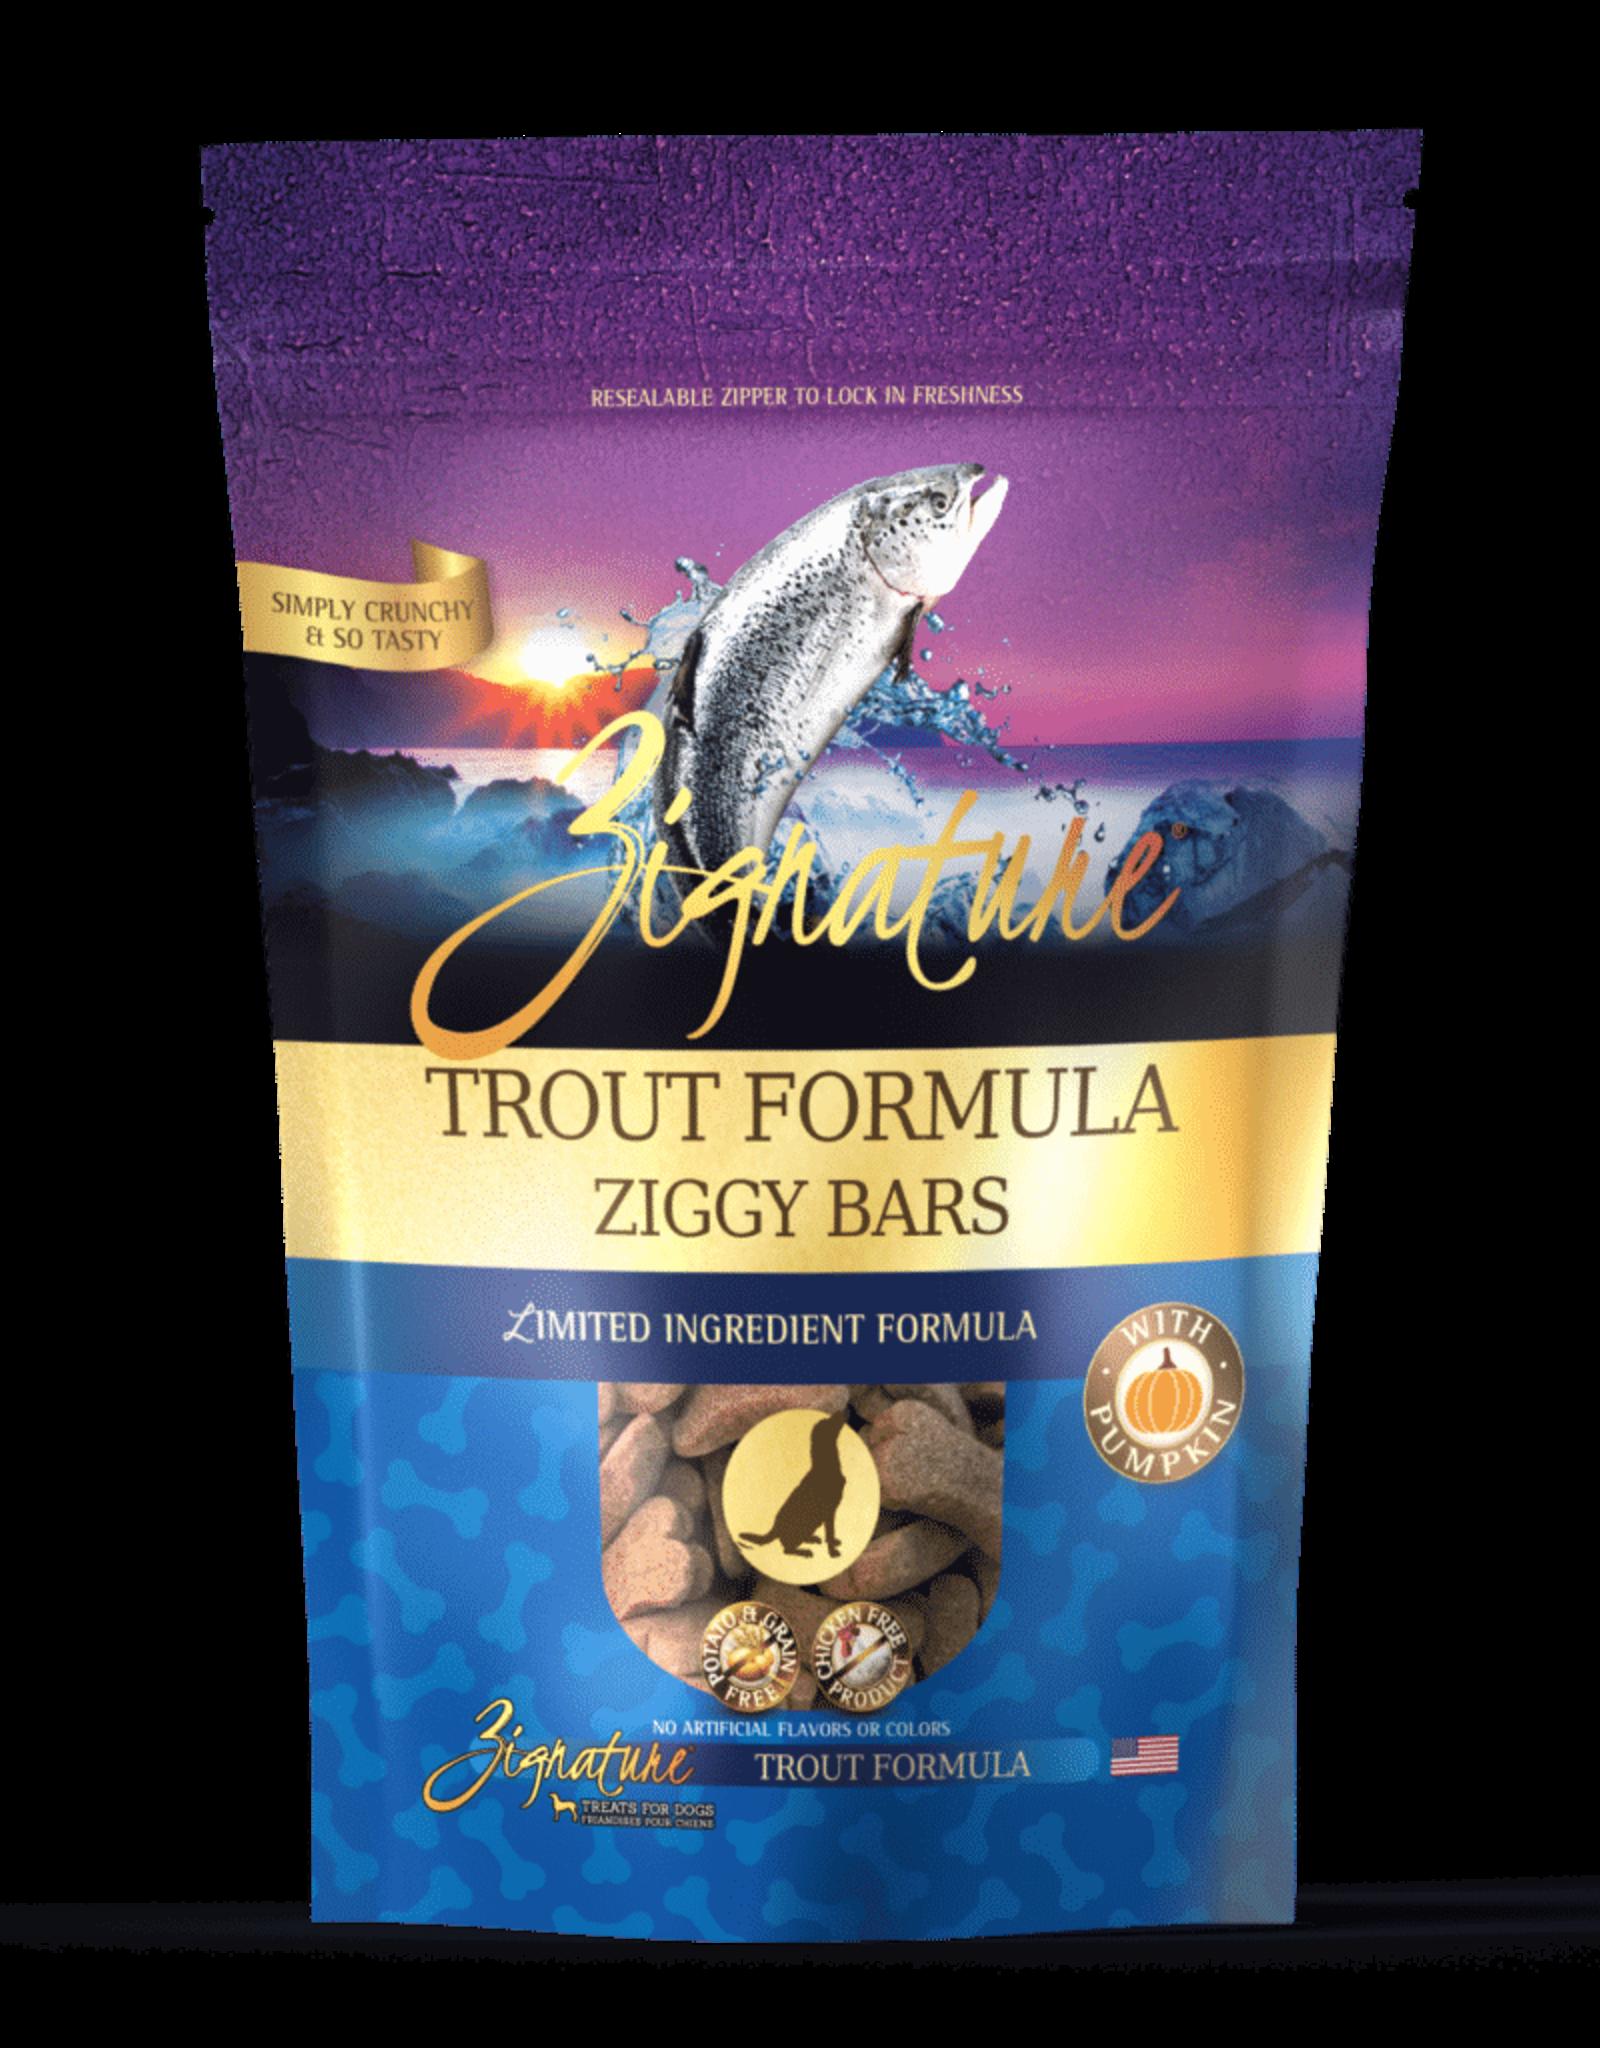 Zignature Ziggy Bar Trout Formula - 12oz